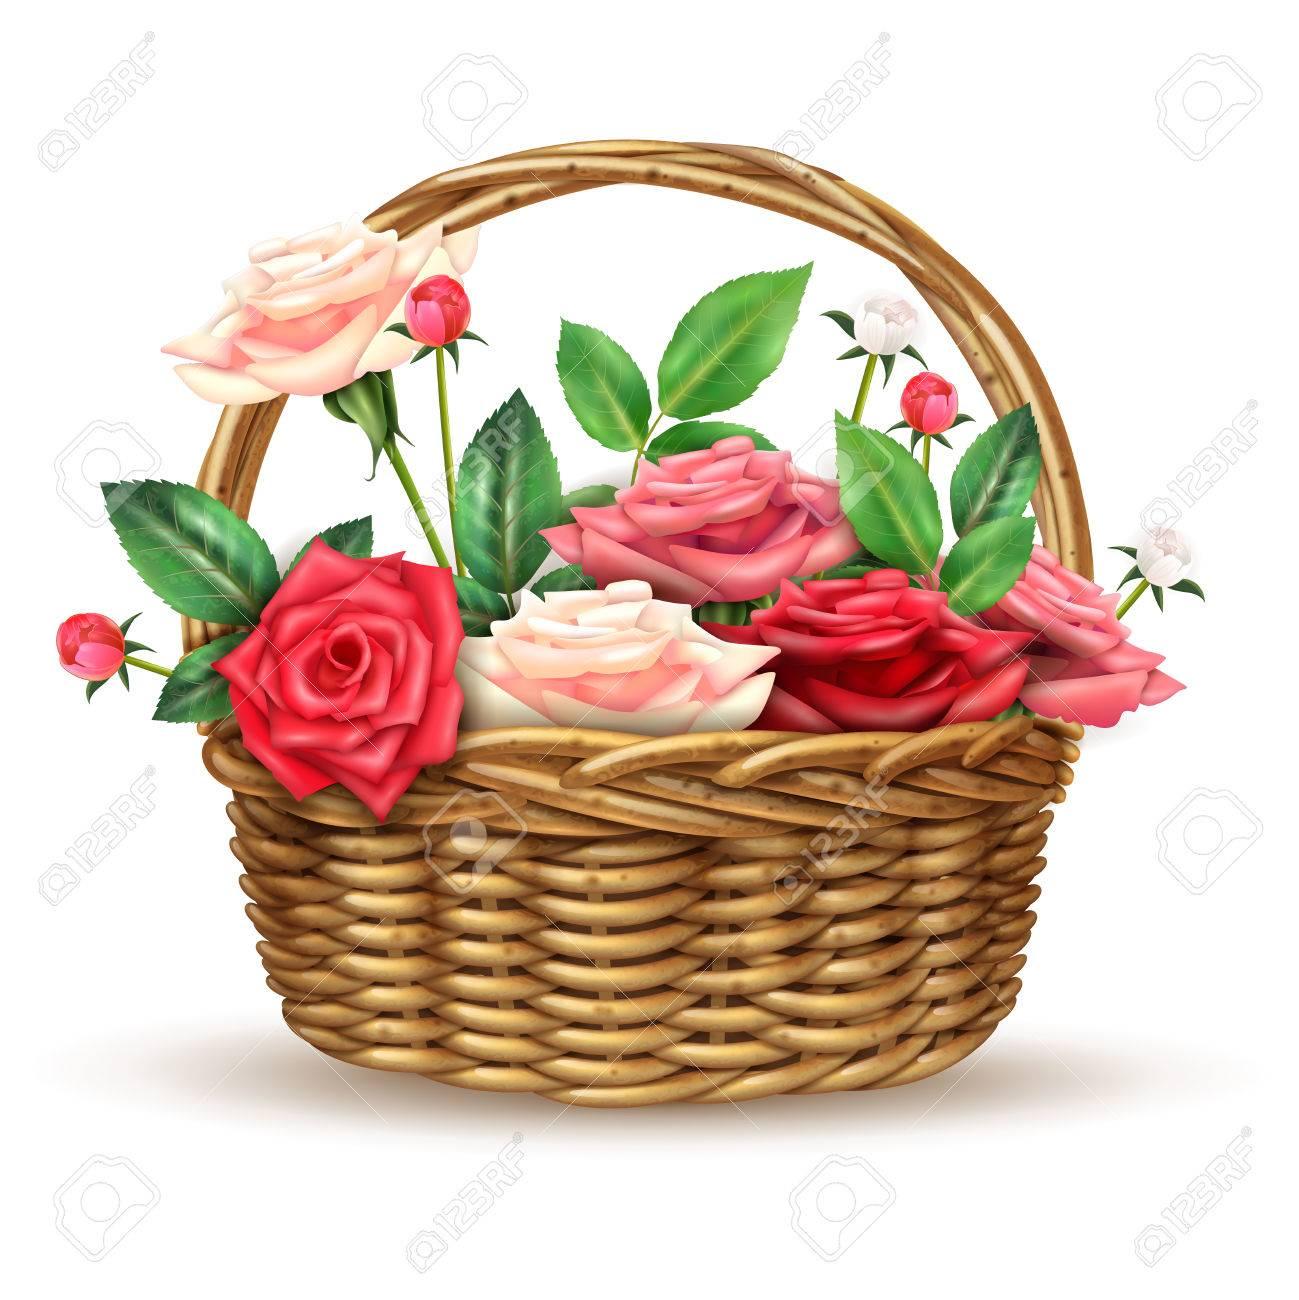 Beautiful flowers basket arrangement full with fine fresh roses beautiful flowers basket arrangement full with fine fresh roses for special occasions realistic close up izmirmasajfo